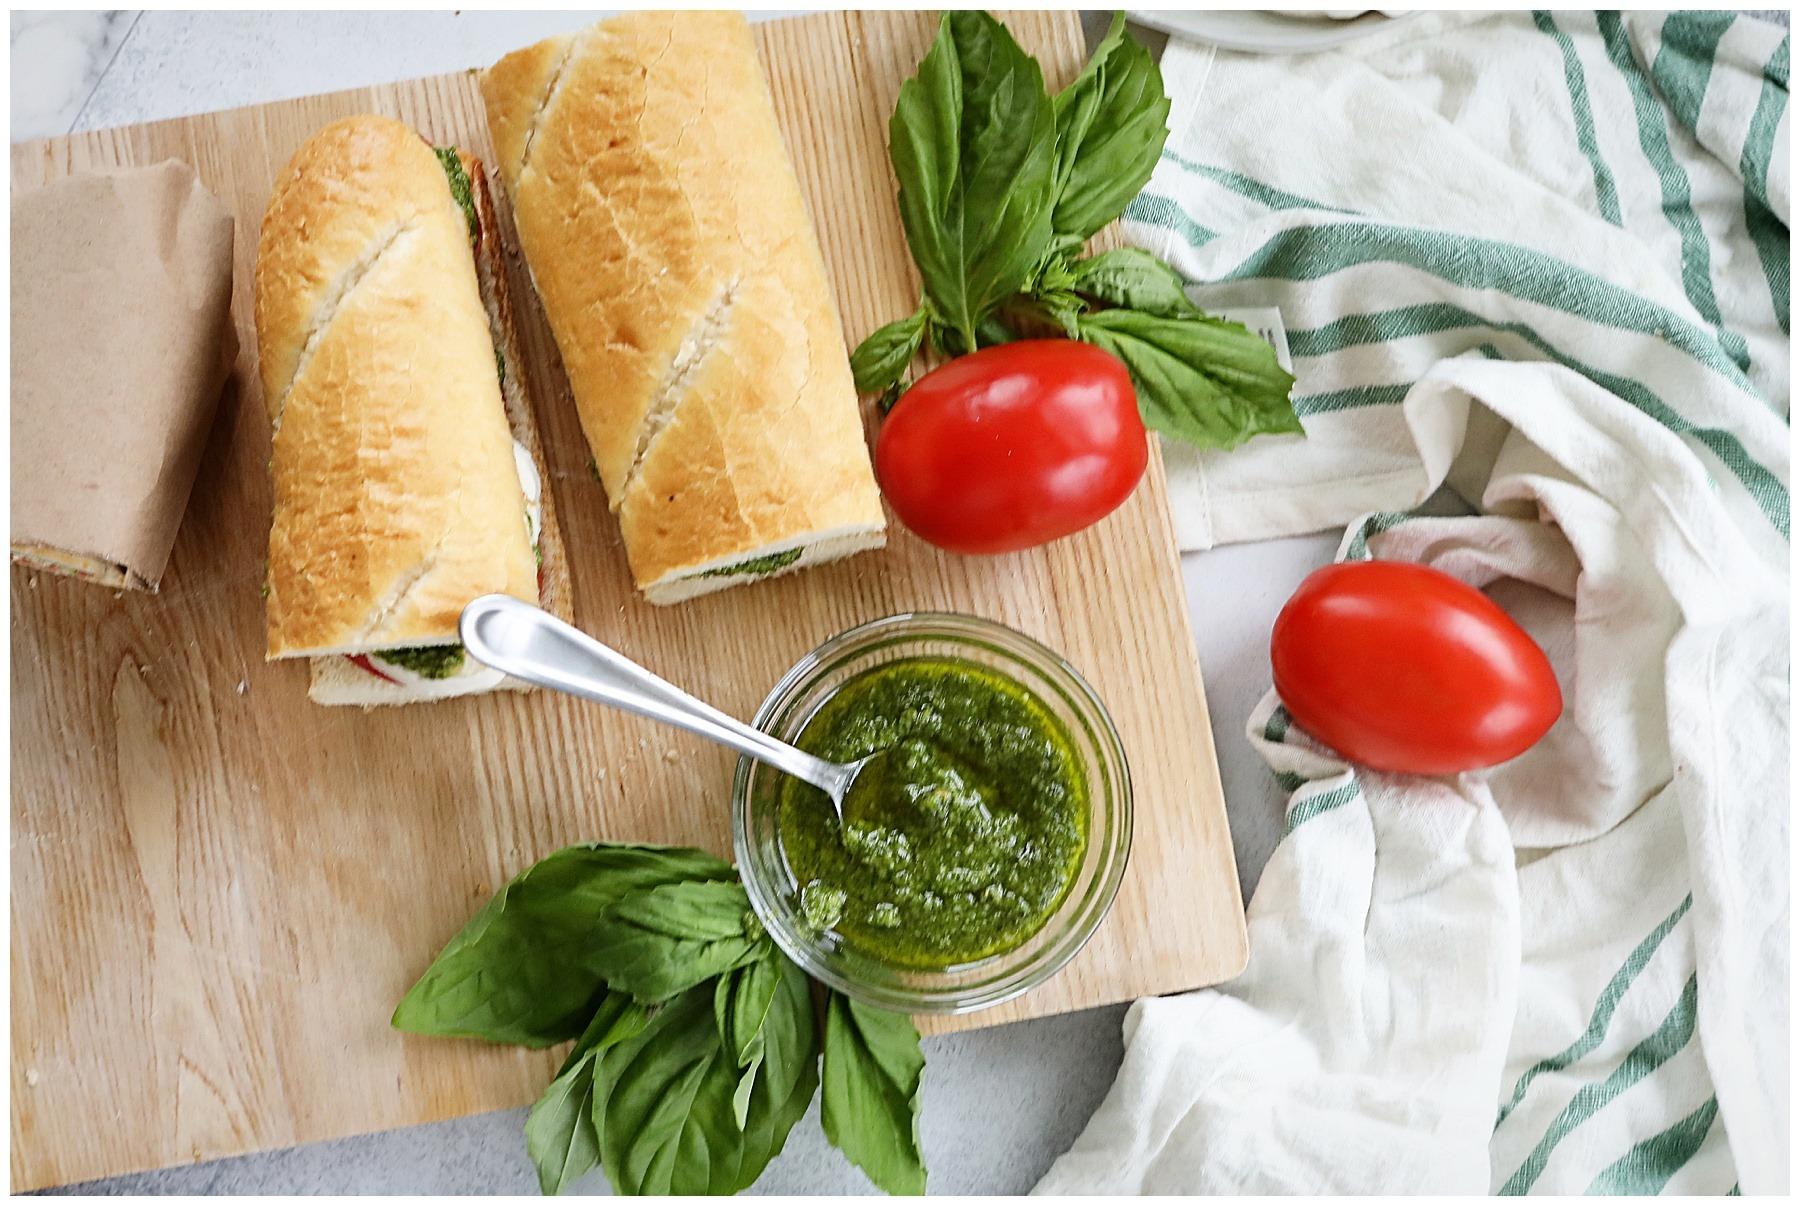 Simple and delicious Basil Pesto recipe